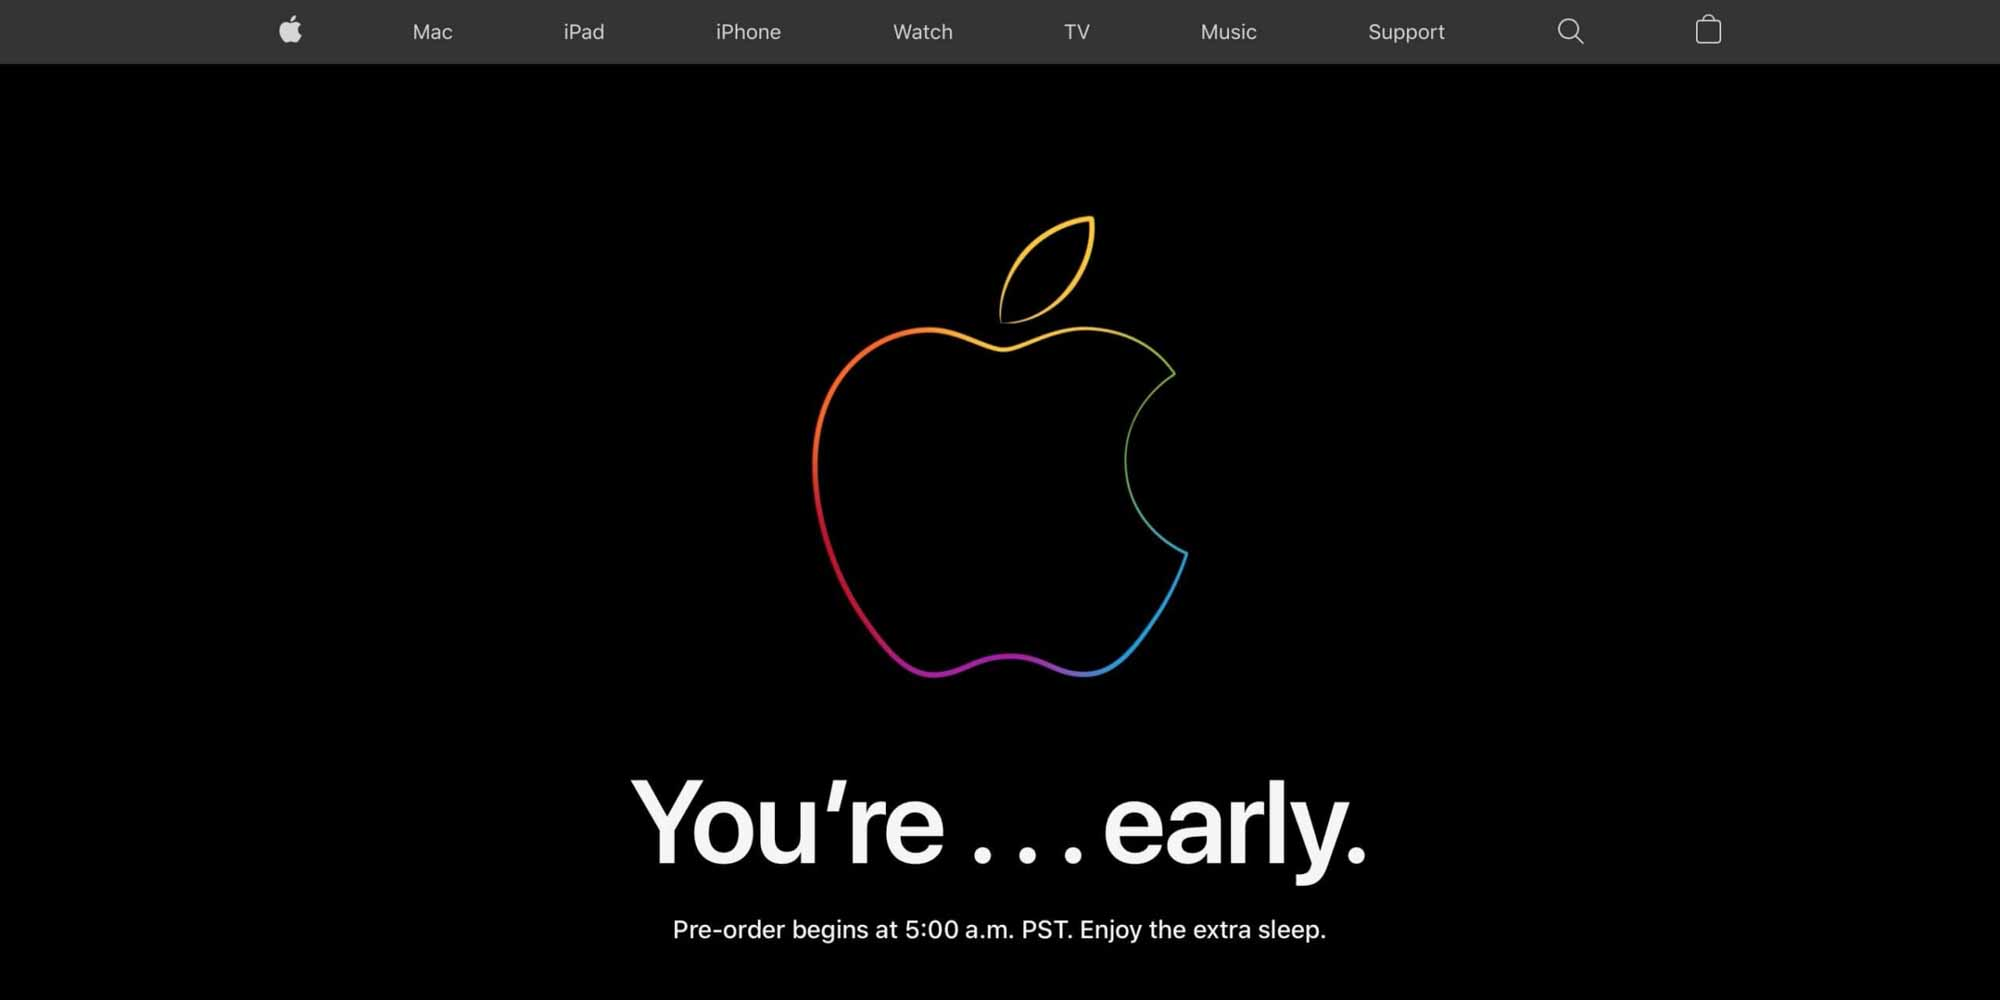 Apple Store опередил предзаказы iPhone 12 mini, iPhone 12 Pro Max и HomePod mini